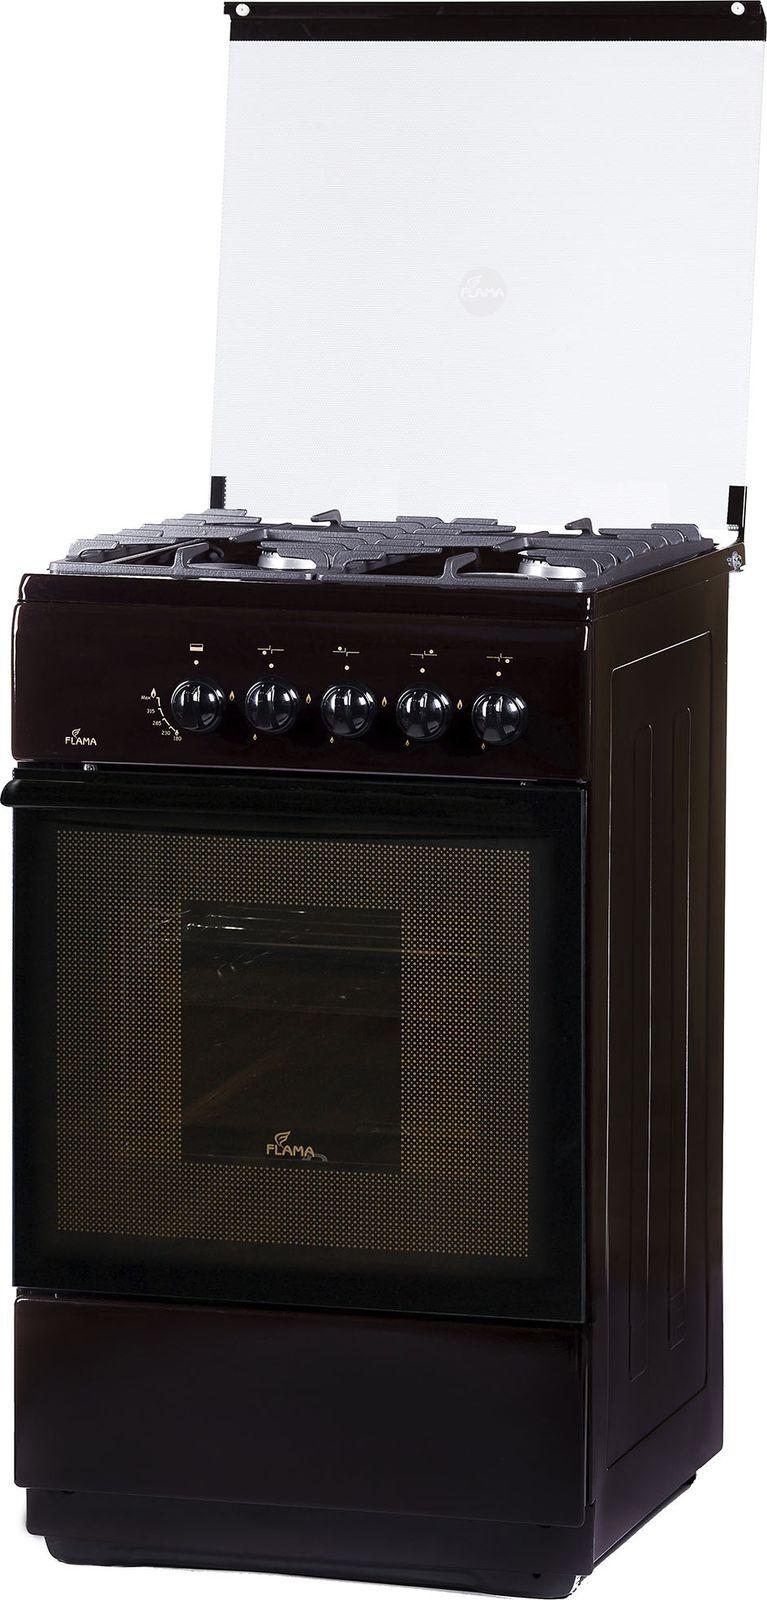 Кухонная плита Flama FG 24022 B, коричневый